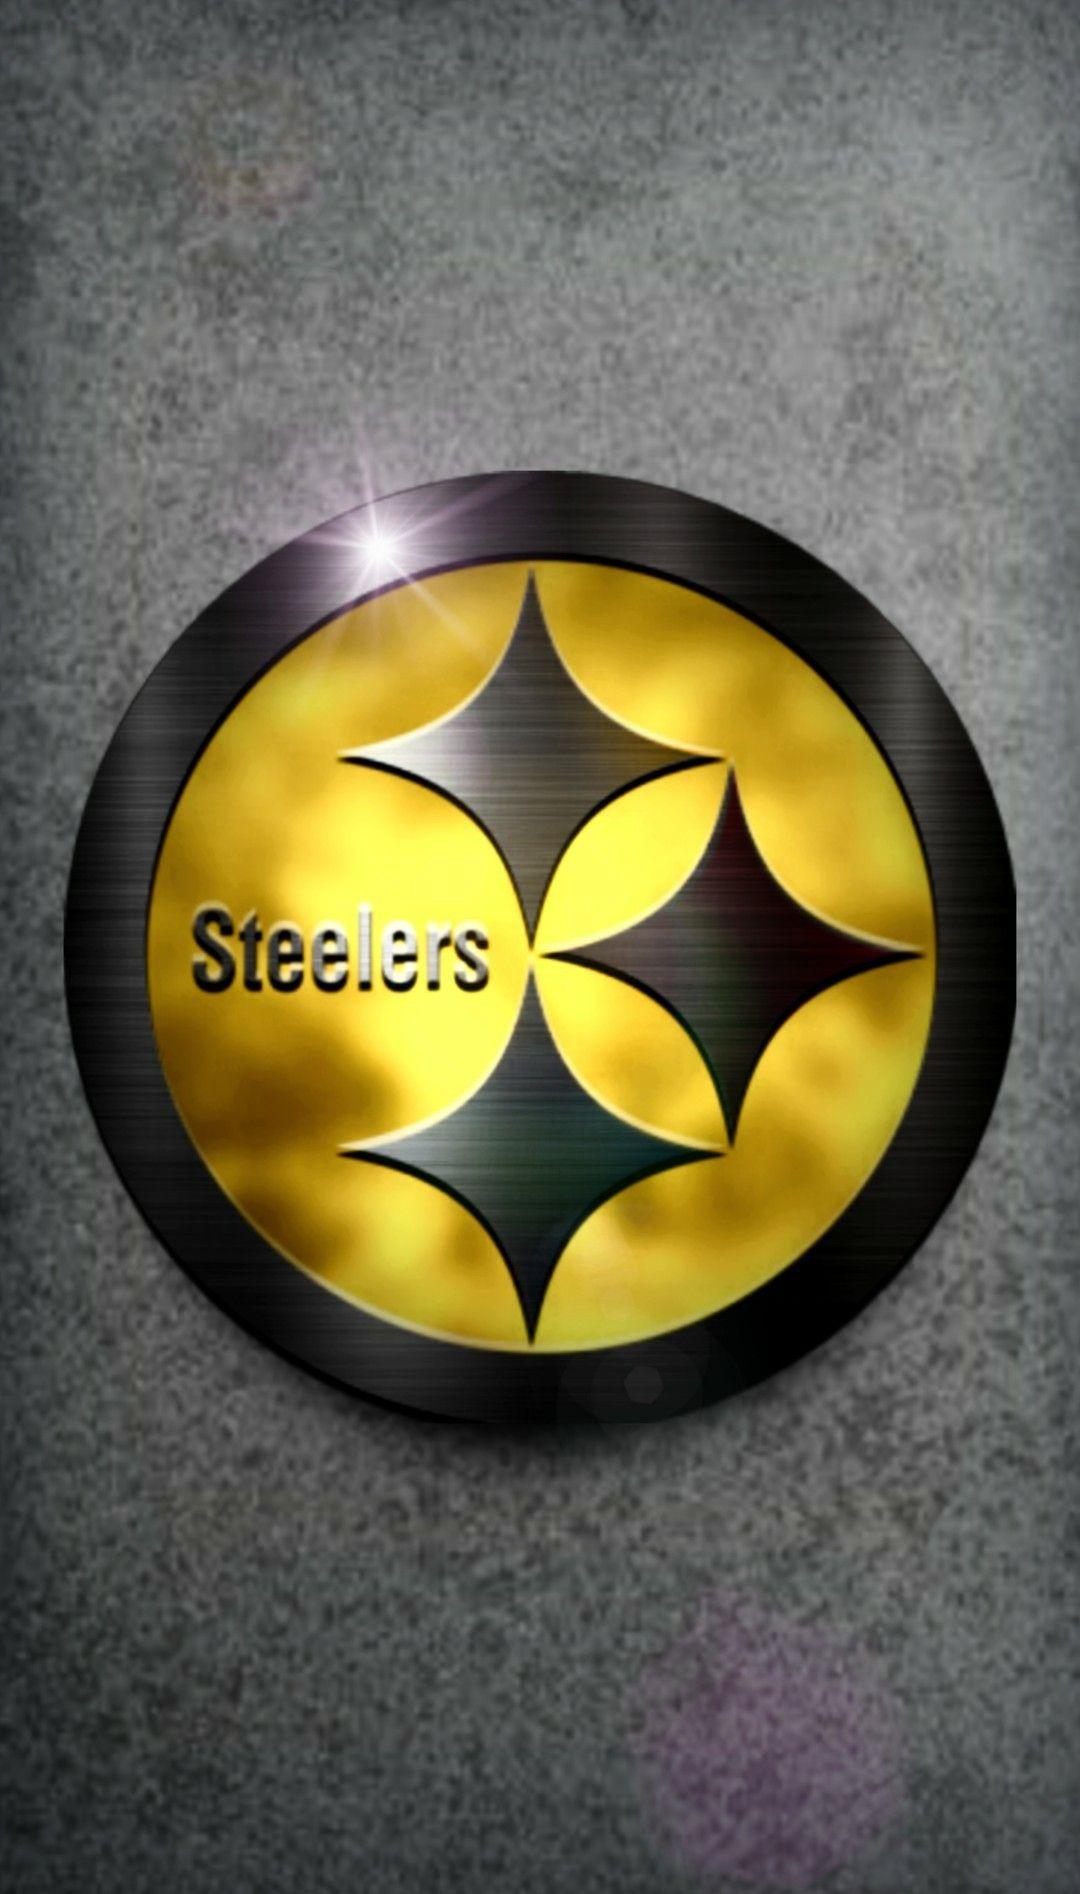 Pittsburgh Steelers Wallpaper Pittsburgh Steelers Wallpaper Pittsburg Steelers Pittsburgh Steelers